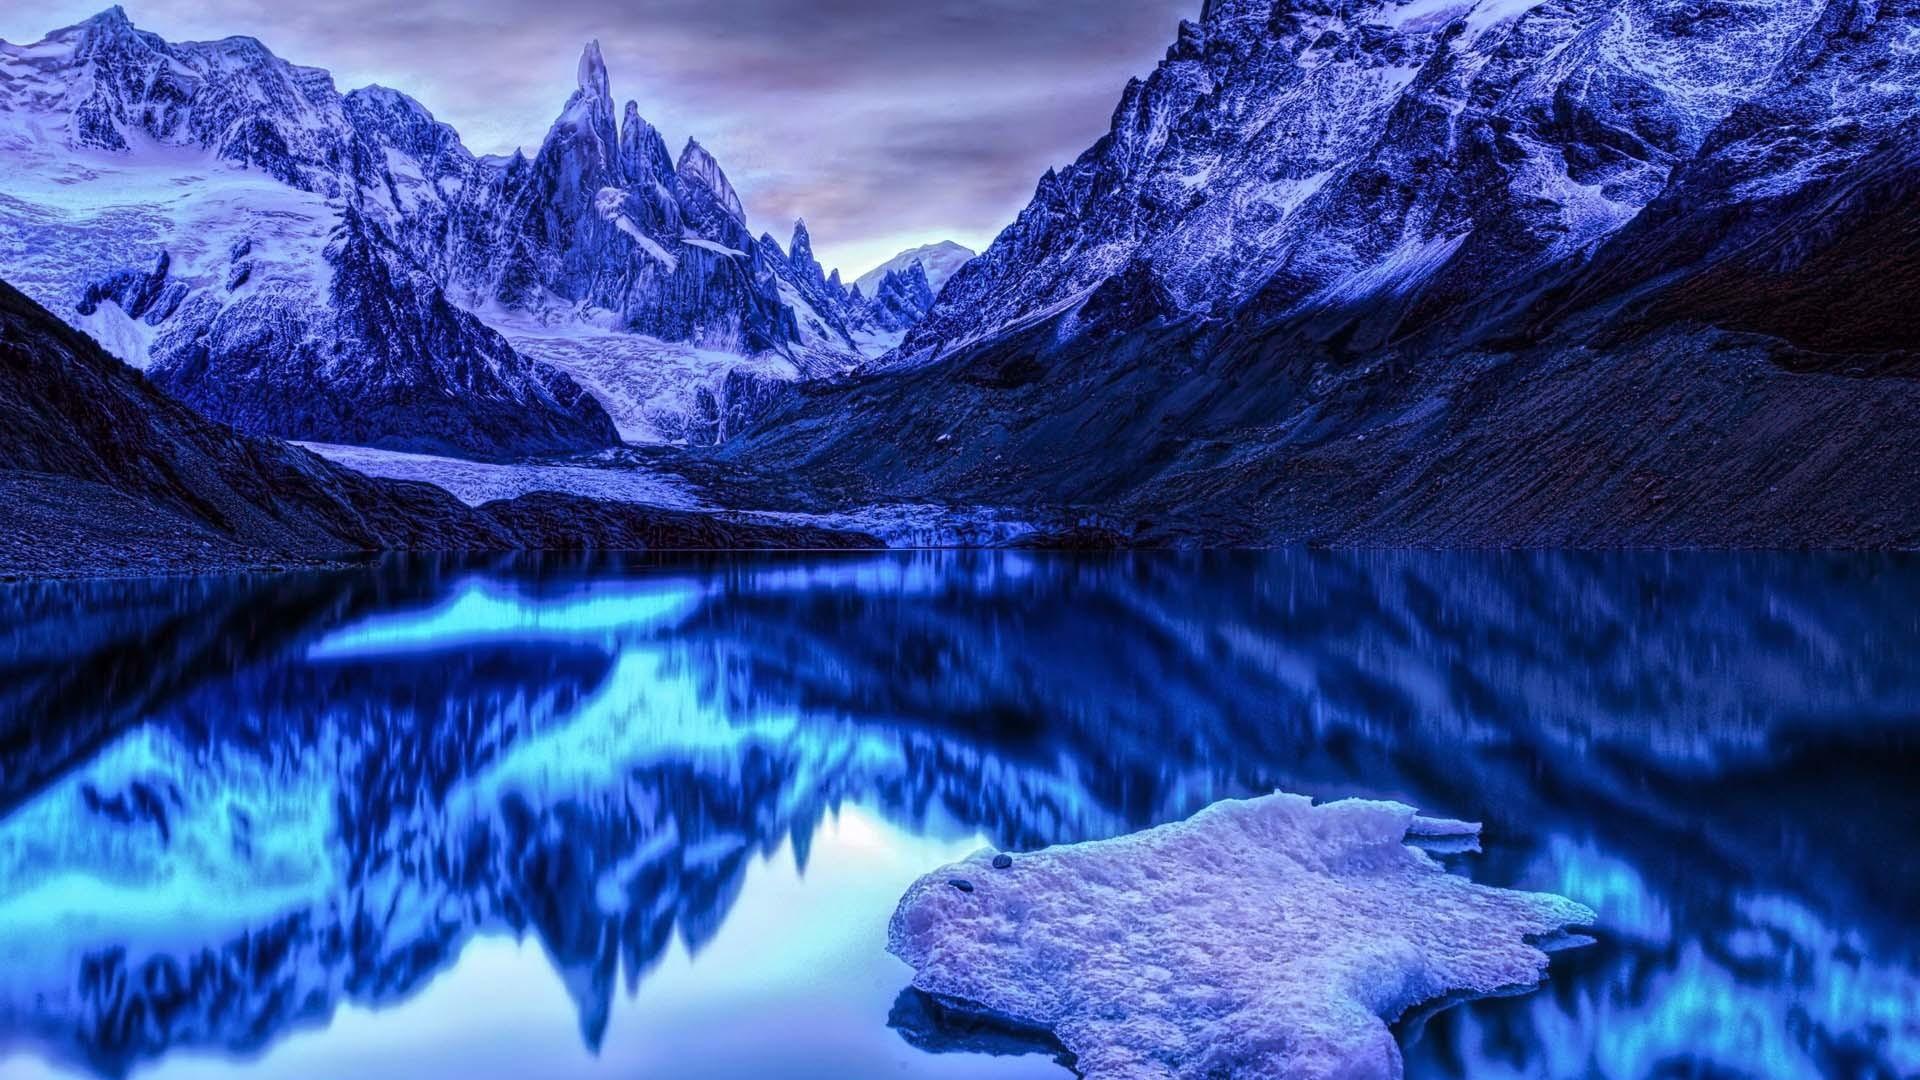 Great Wallpaper Mountain Winter - 1160367-gorgerous-smoky-mountain-winter-scenes-wallpaper-1920x1080-for-windows  Picture_49421.jpg